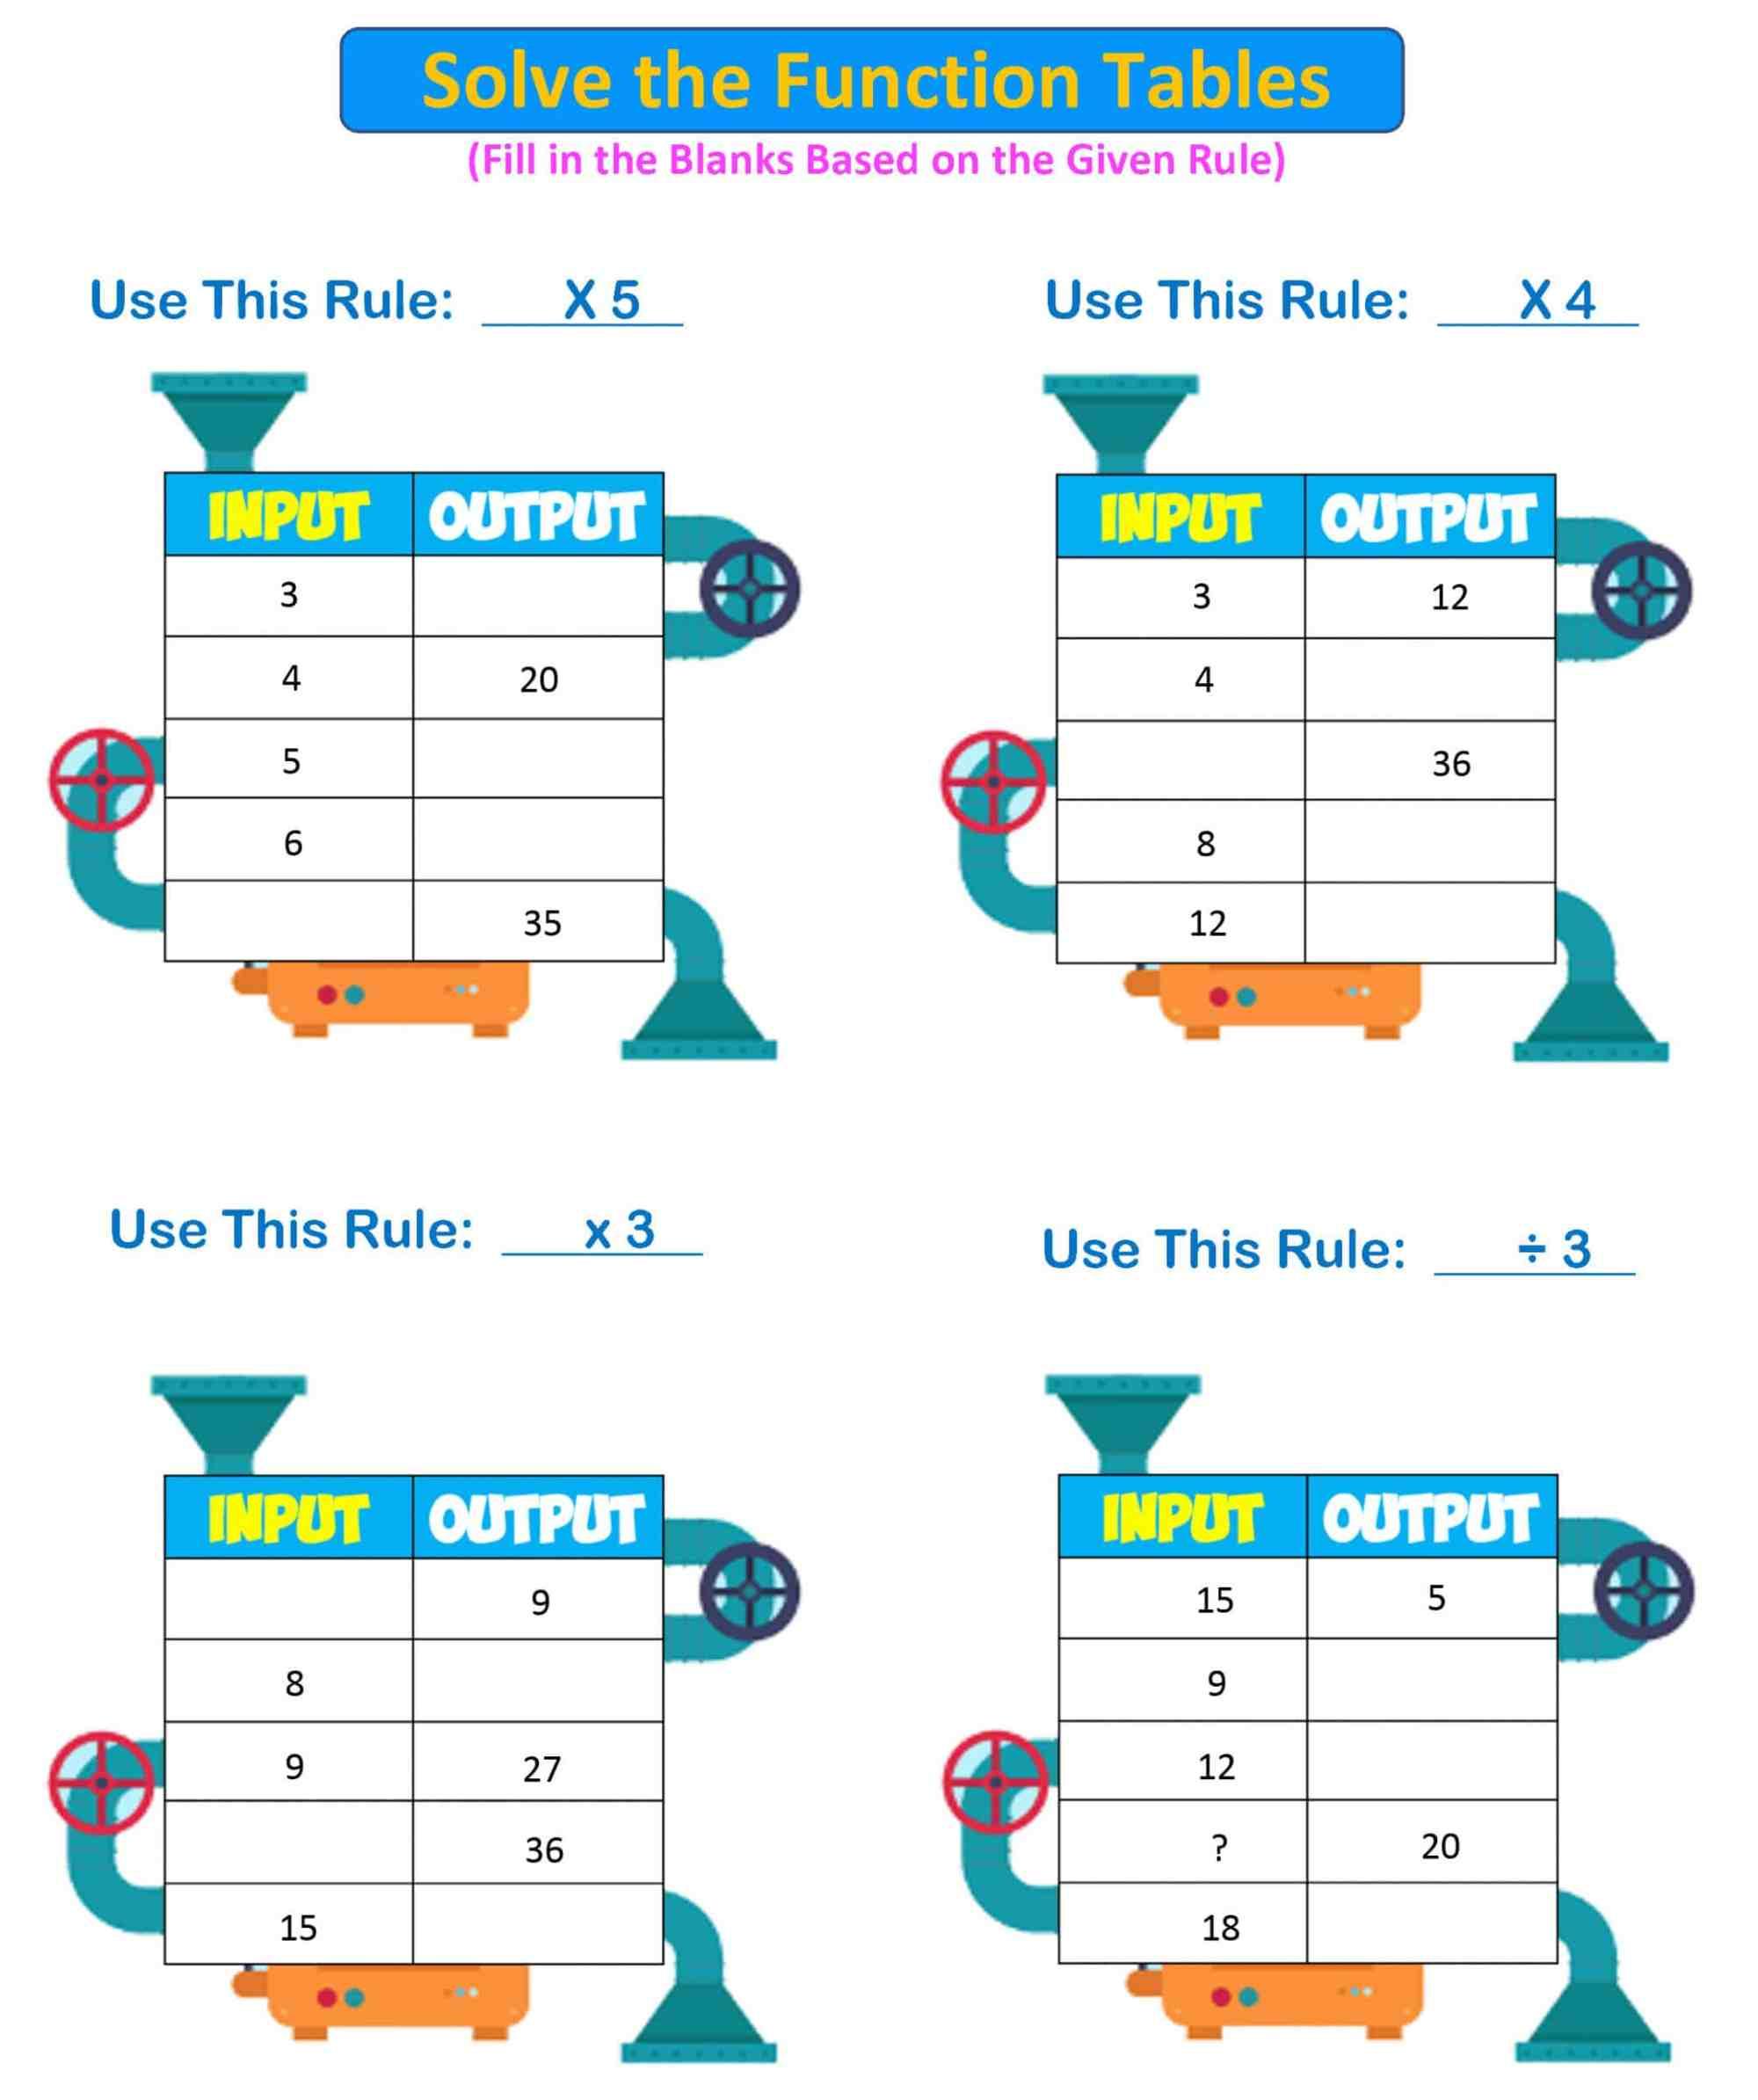 hight resolution of input-output-machine 3rd grade 3 - Mr. R.'s World of Math